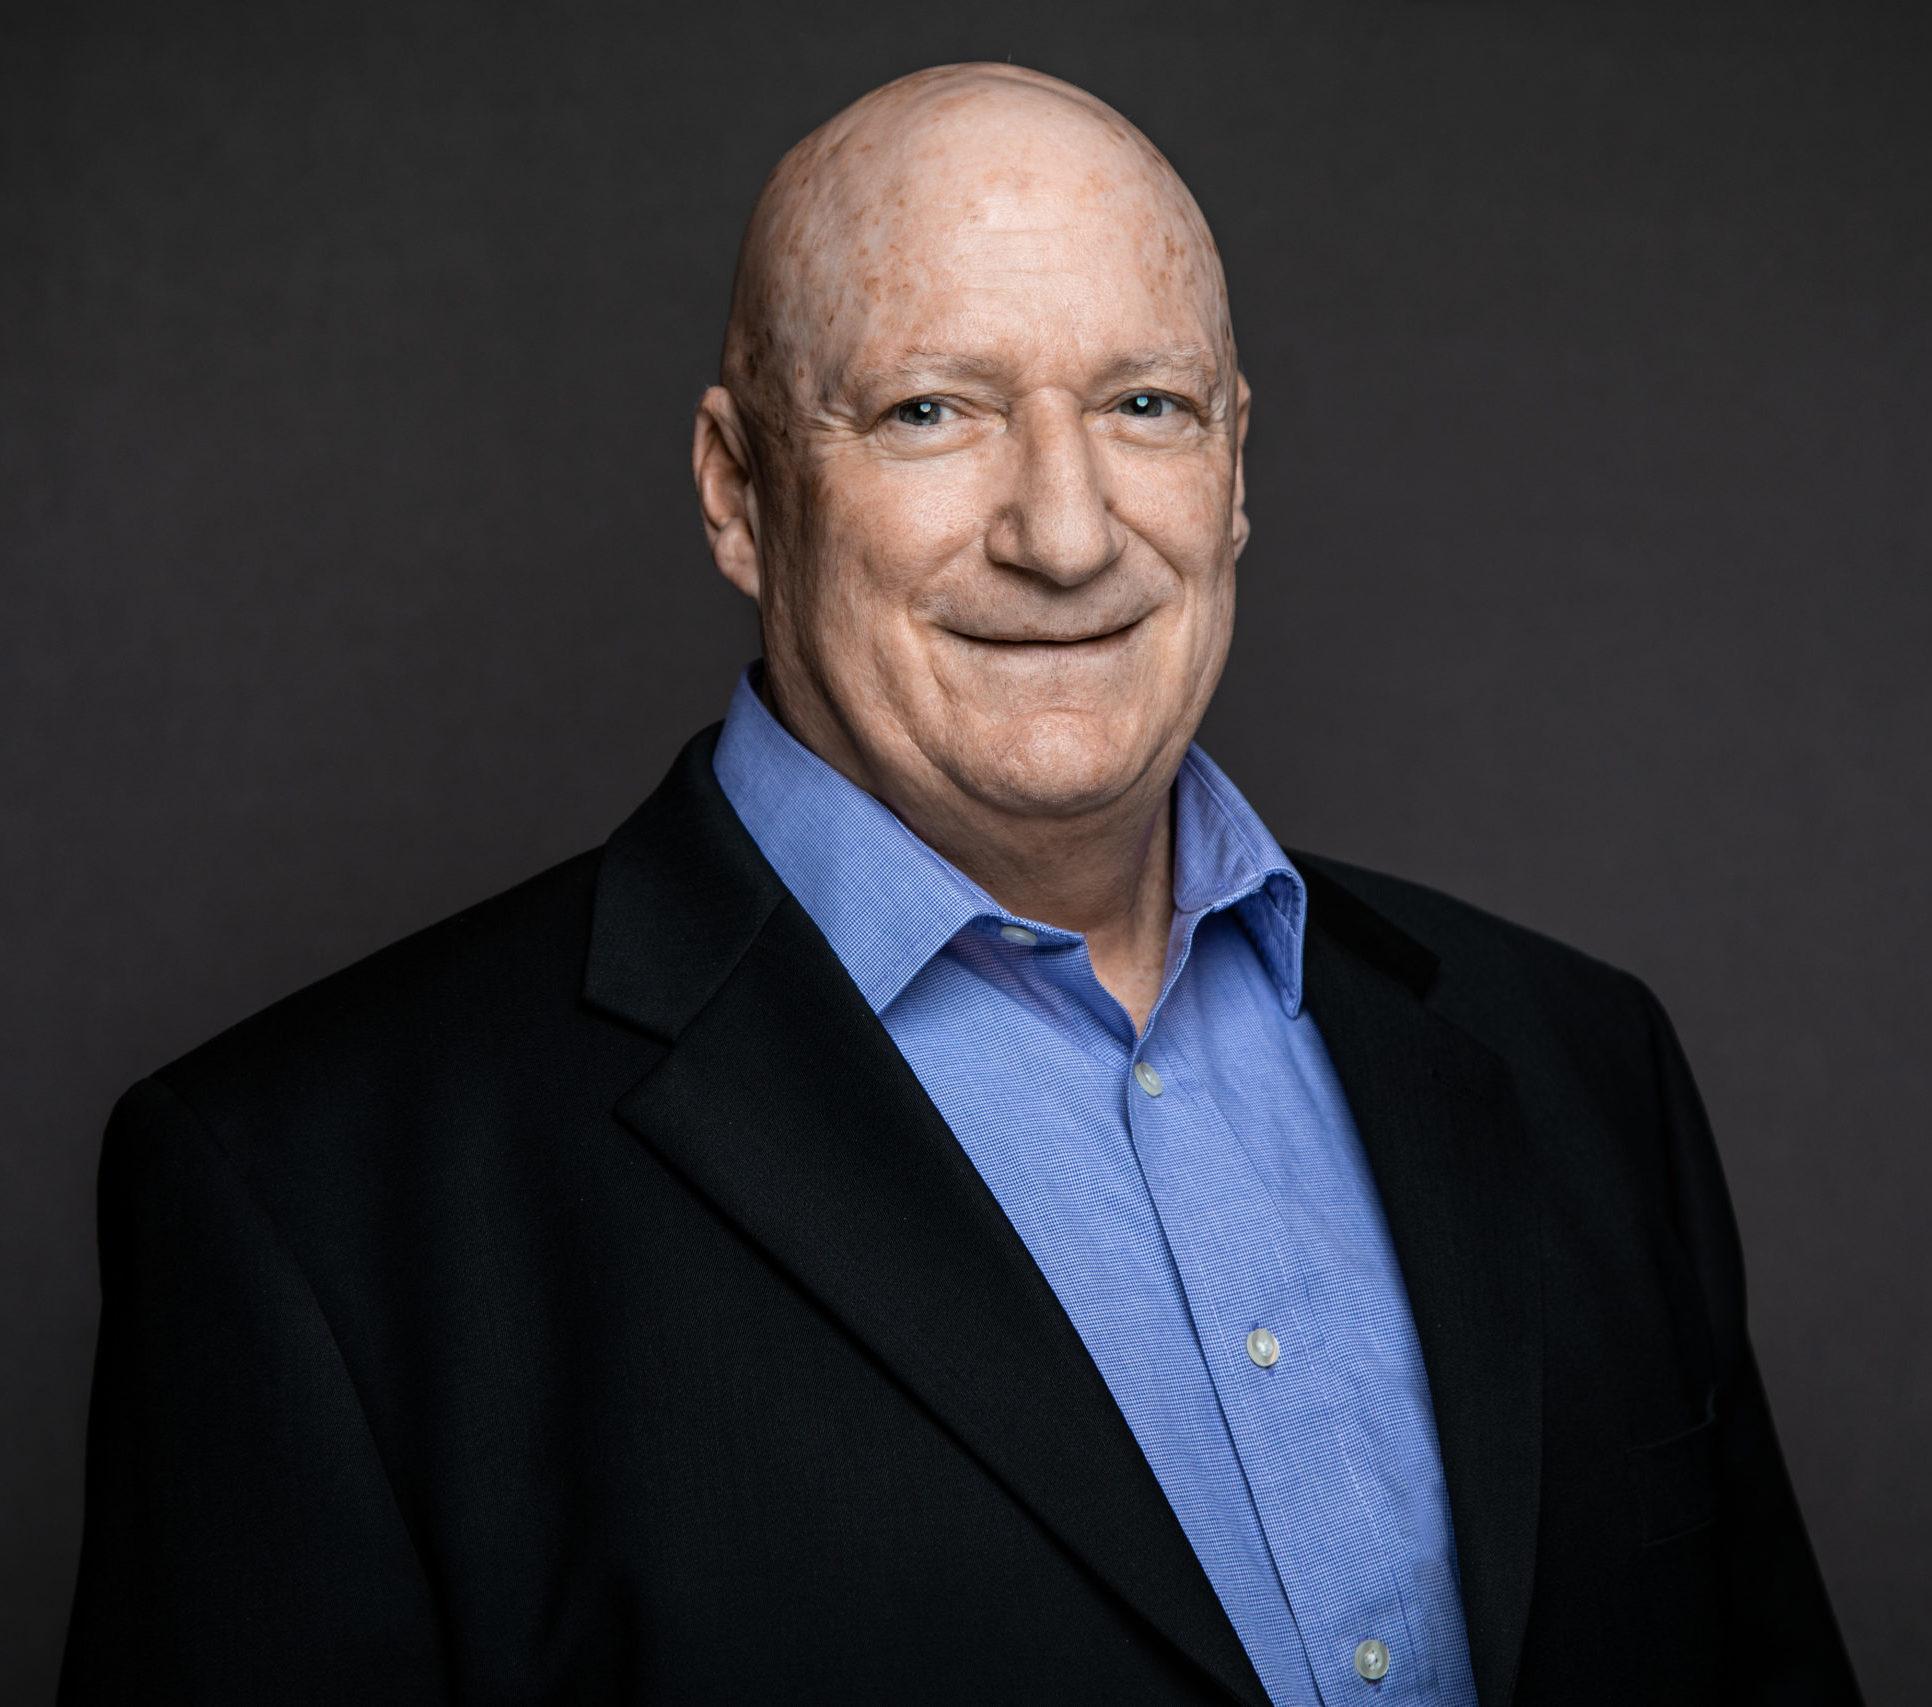 Hemp Synergistics Hires Daniel Kohler as CEO